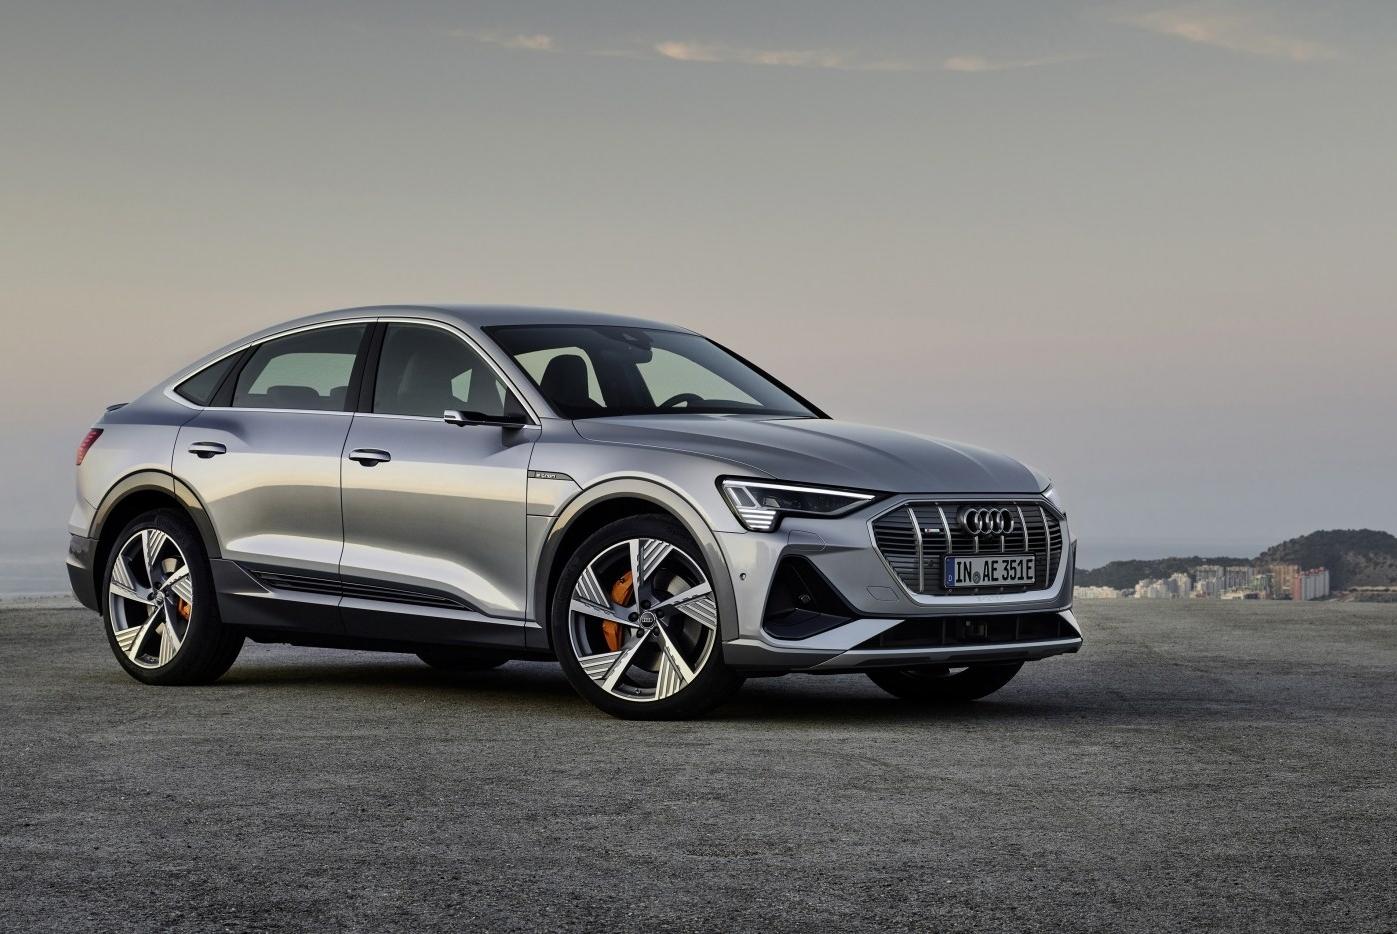 Audi e-tron Sportback (GE) - цены, отзывы, характеристики e-tron Sportback  (GE) от Audi